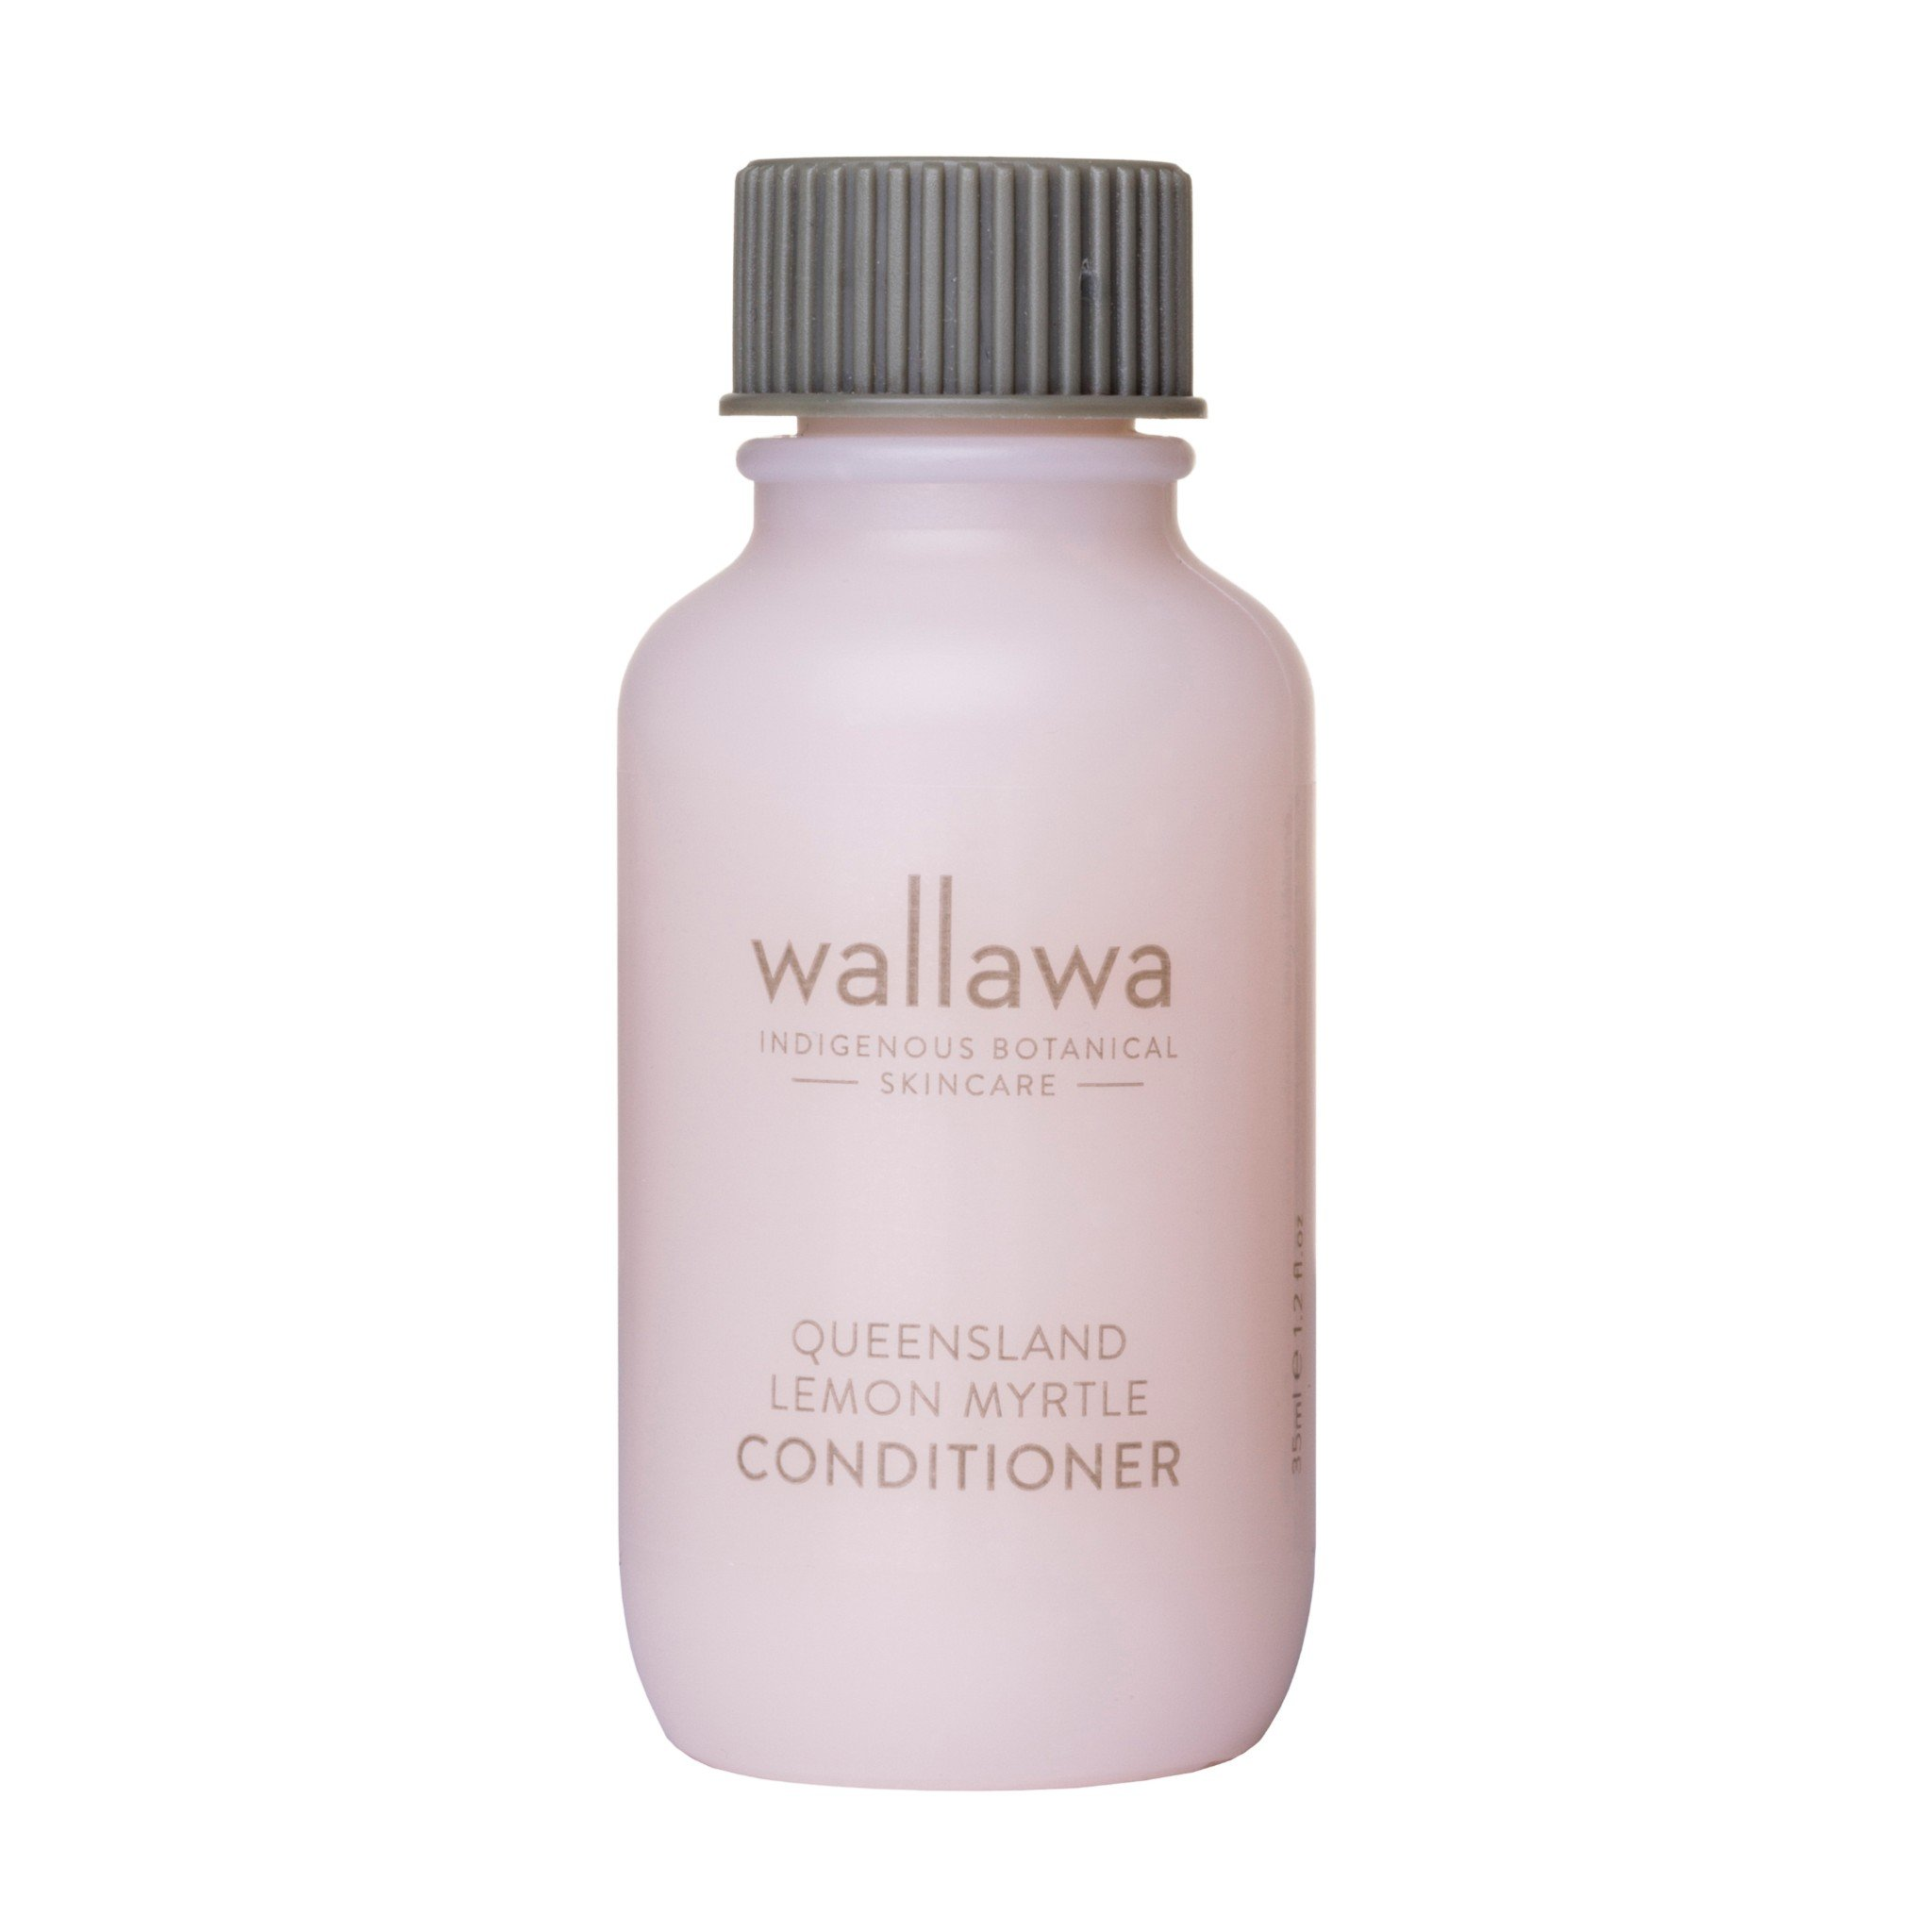 Wallawa Conditioner (50 units)